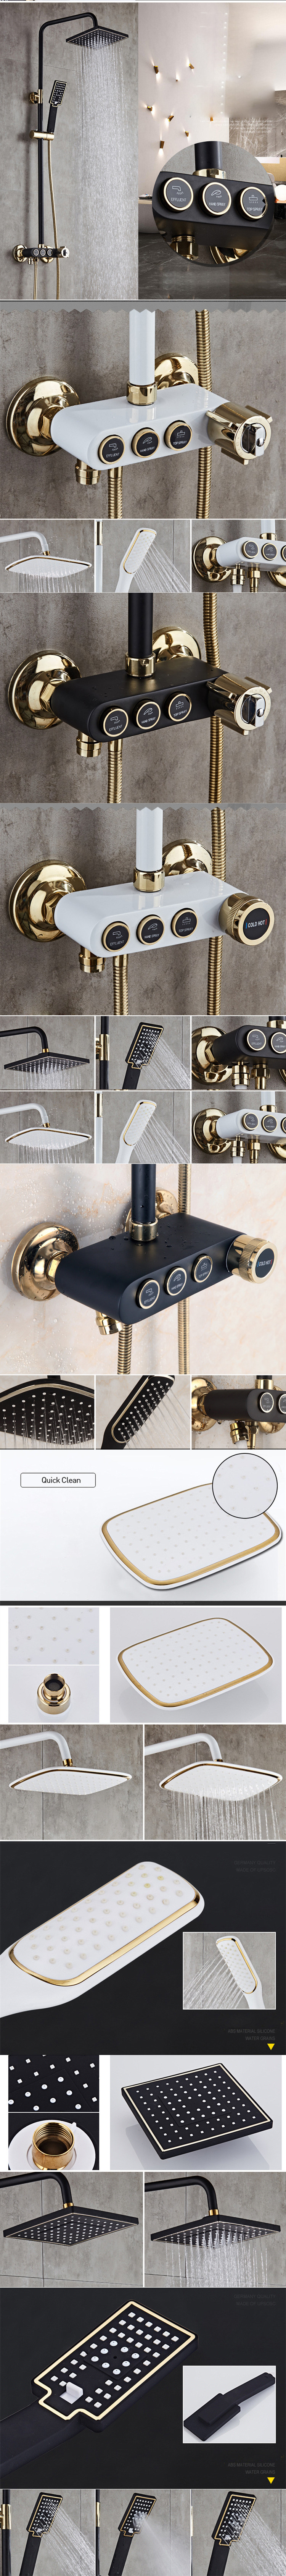 HTB1nOosRkzoK1RjSZFlq6yi4VXaS Senducs Thermostatic Shower Set White Gold Bathroom Shower System Quality Brass Bathtub Faucet Newly Intelligent Gold Shower Set